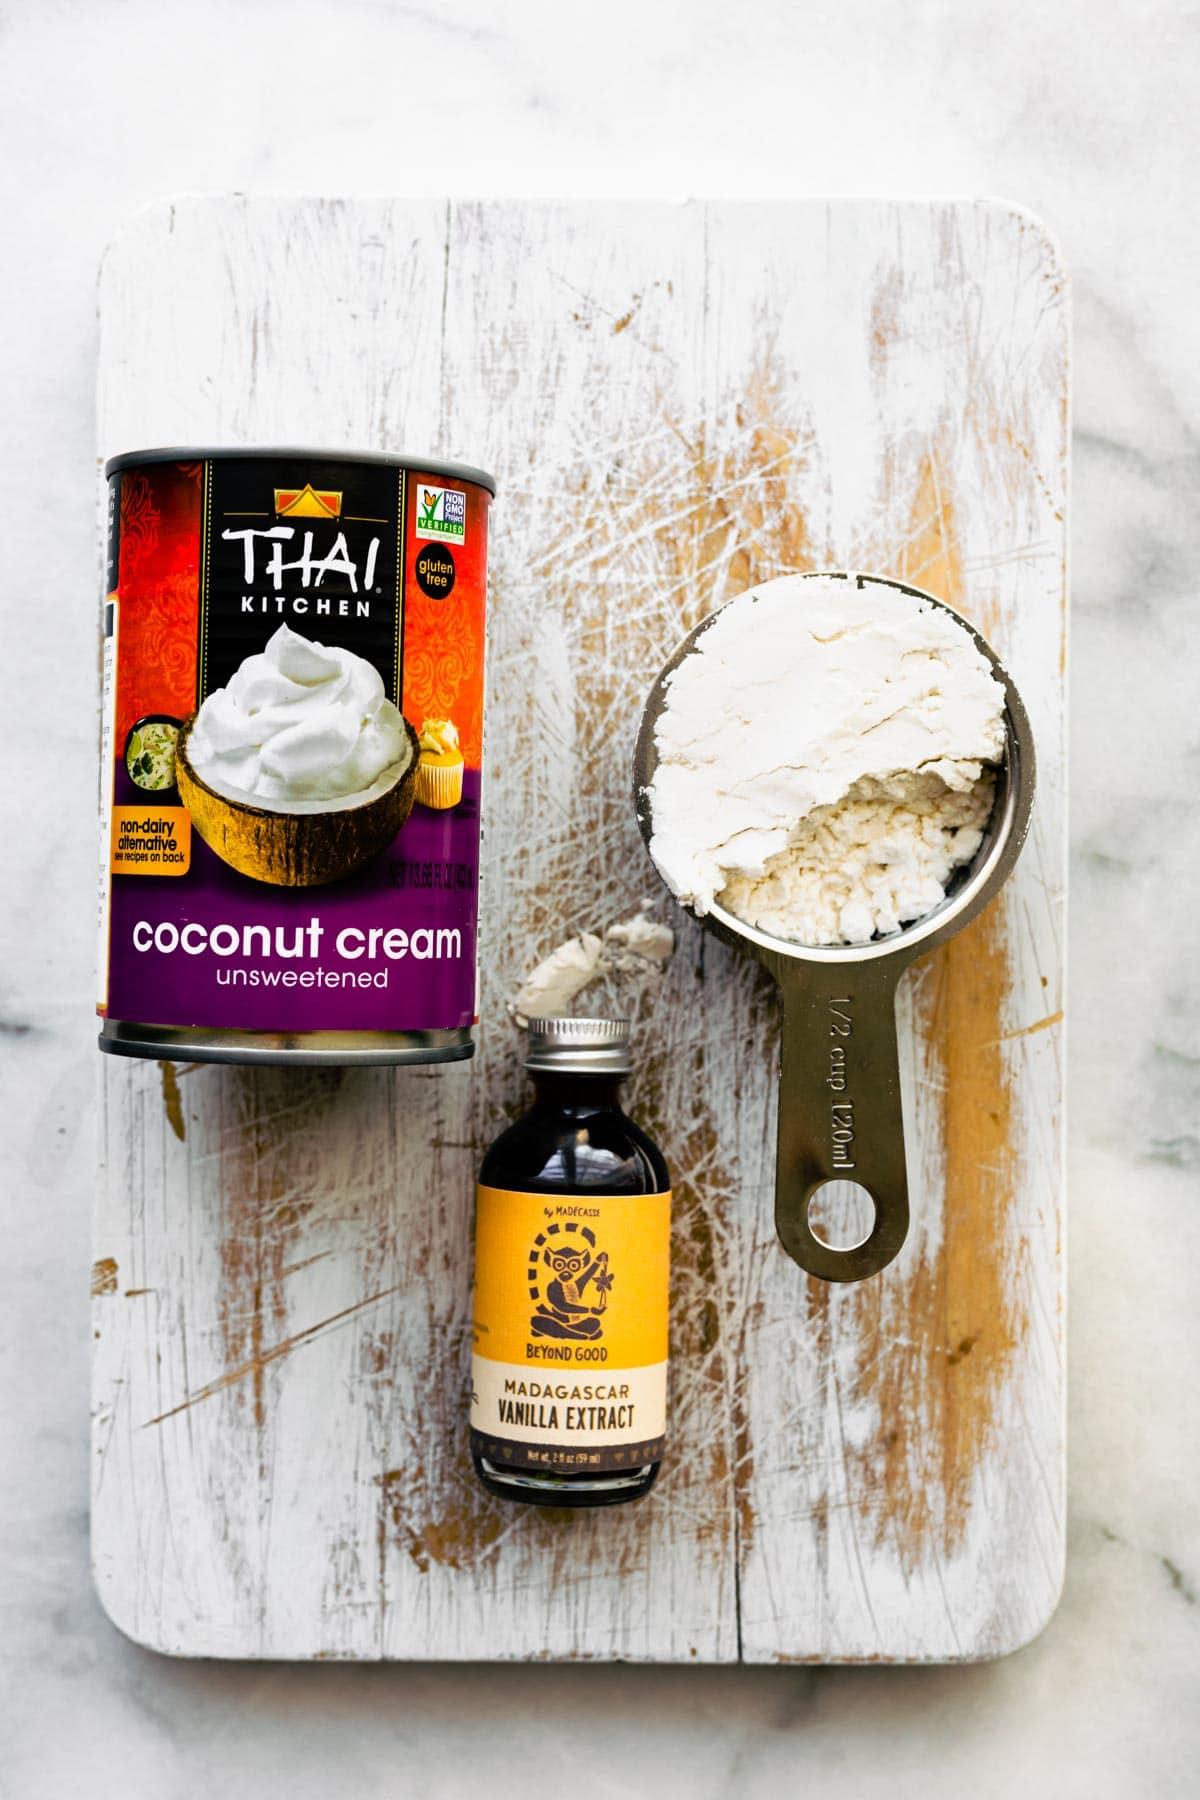 vegan condensed milk ingredients on wooden board: coconut cream, vanilla extract, powdered sugar